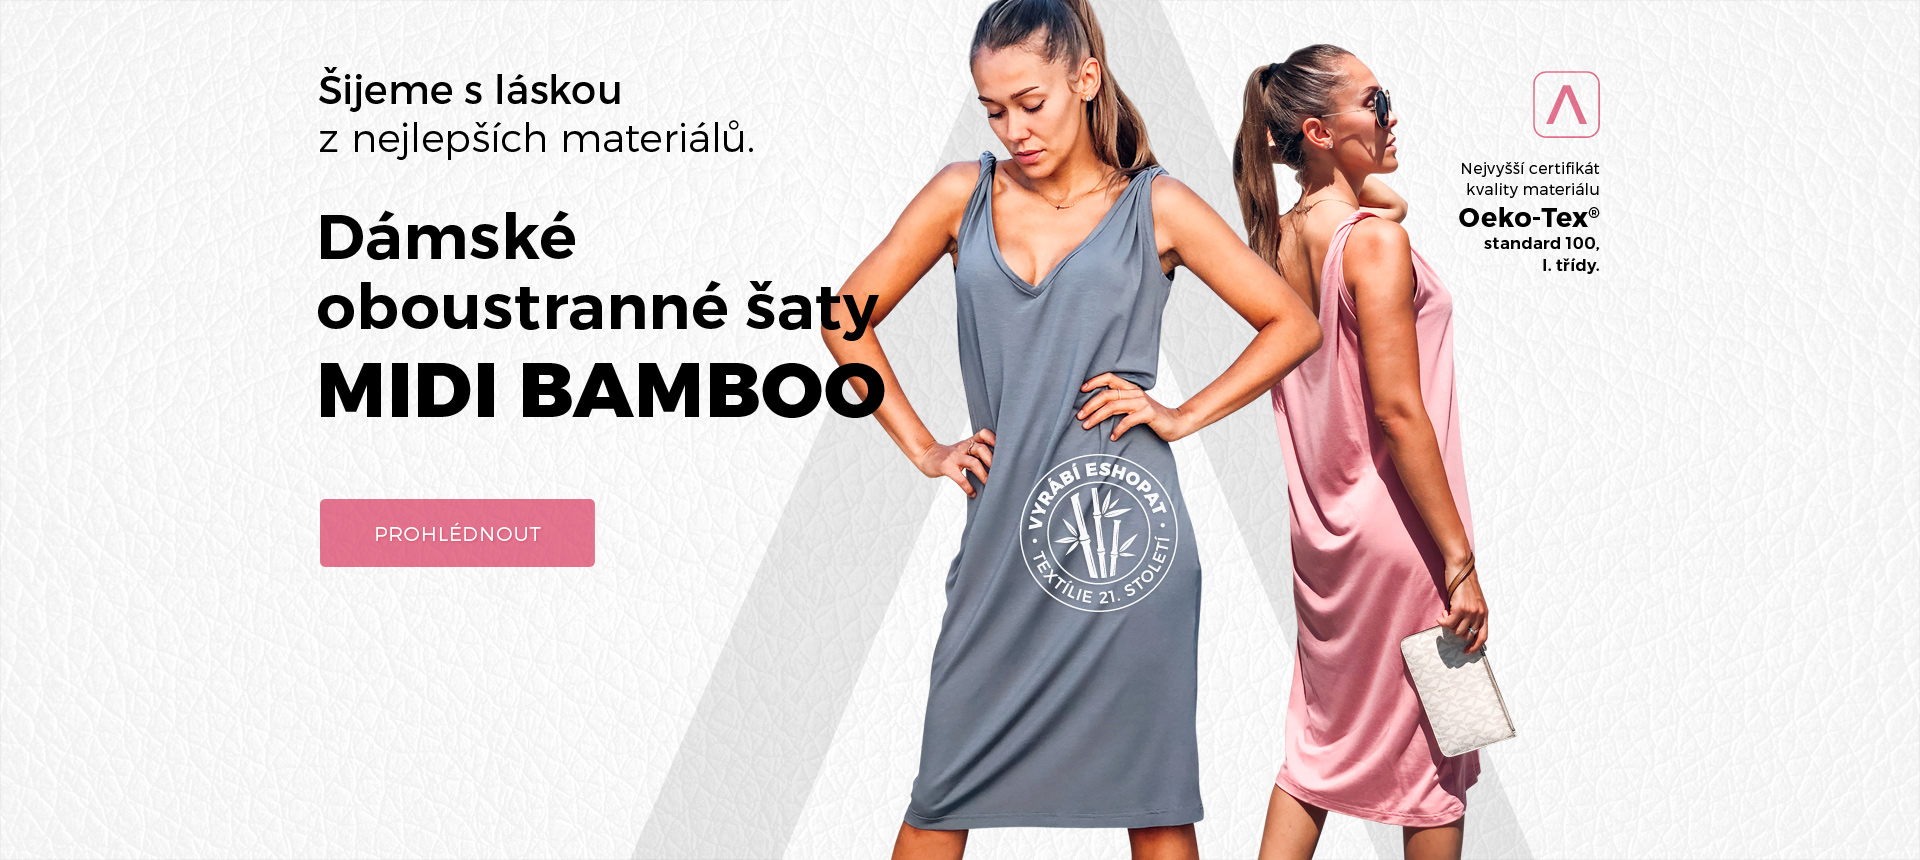 eshopat-cz-banner-hp-midi-bamboo